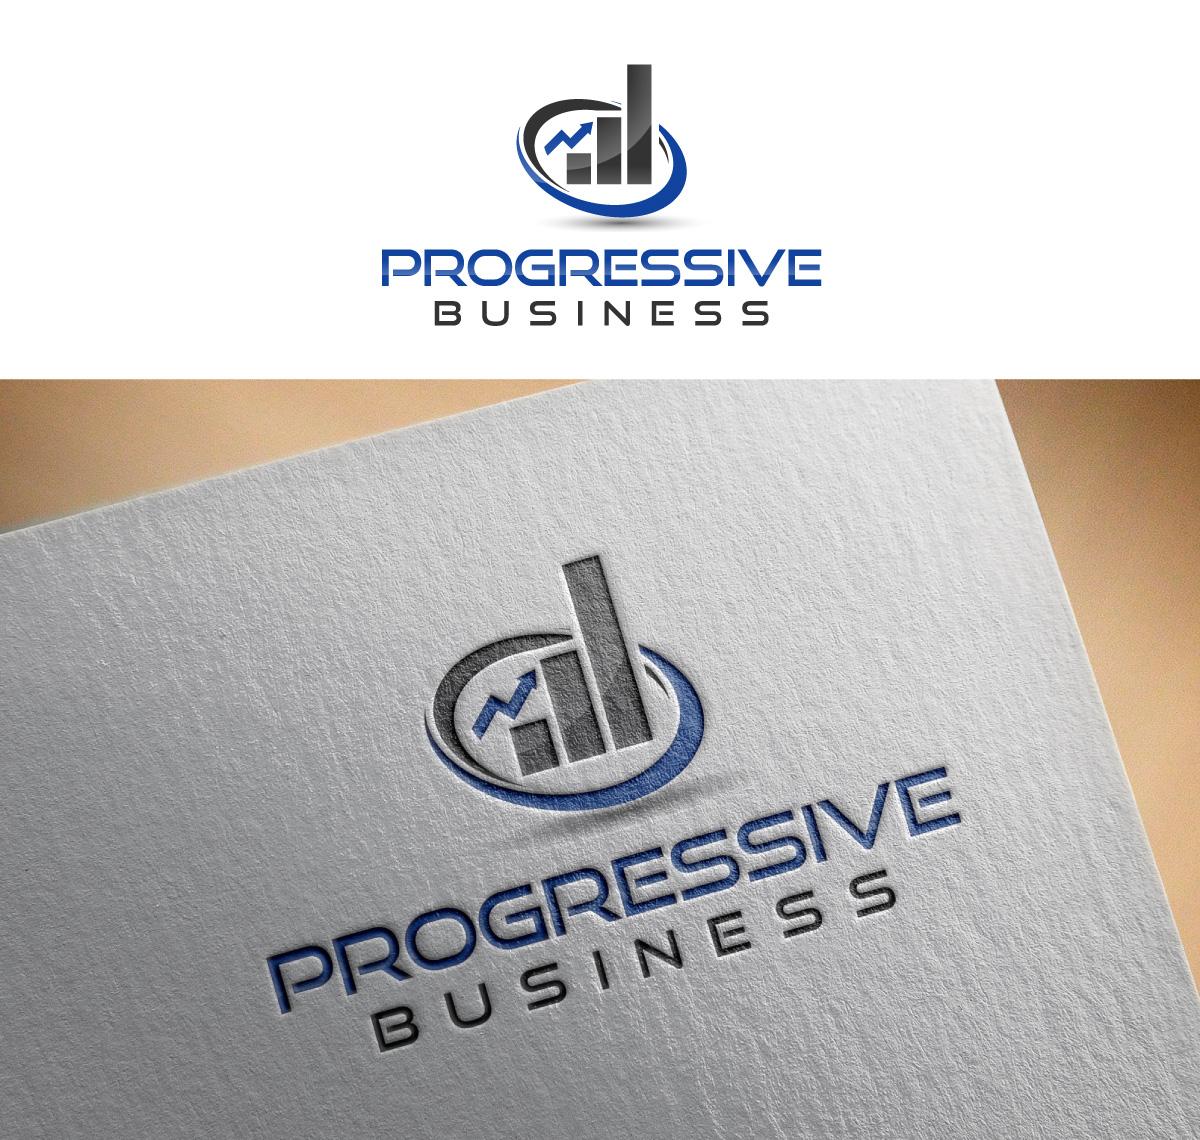 Logo Design by MD SHOHIDUL ISLAM - Entry No. 11 in the Logo Design Contest Captivating Logo Design for Progressive Business.